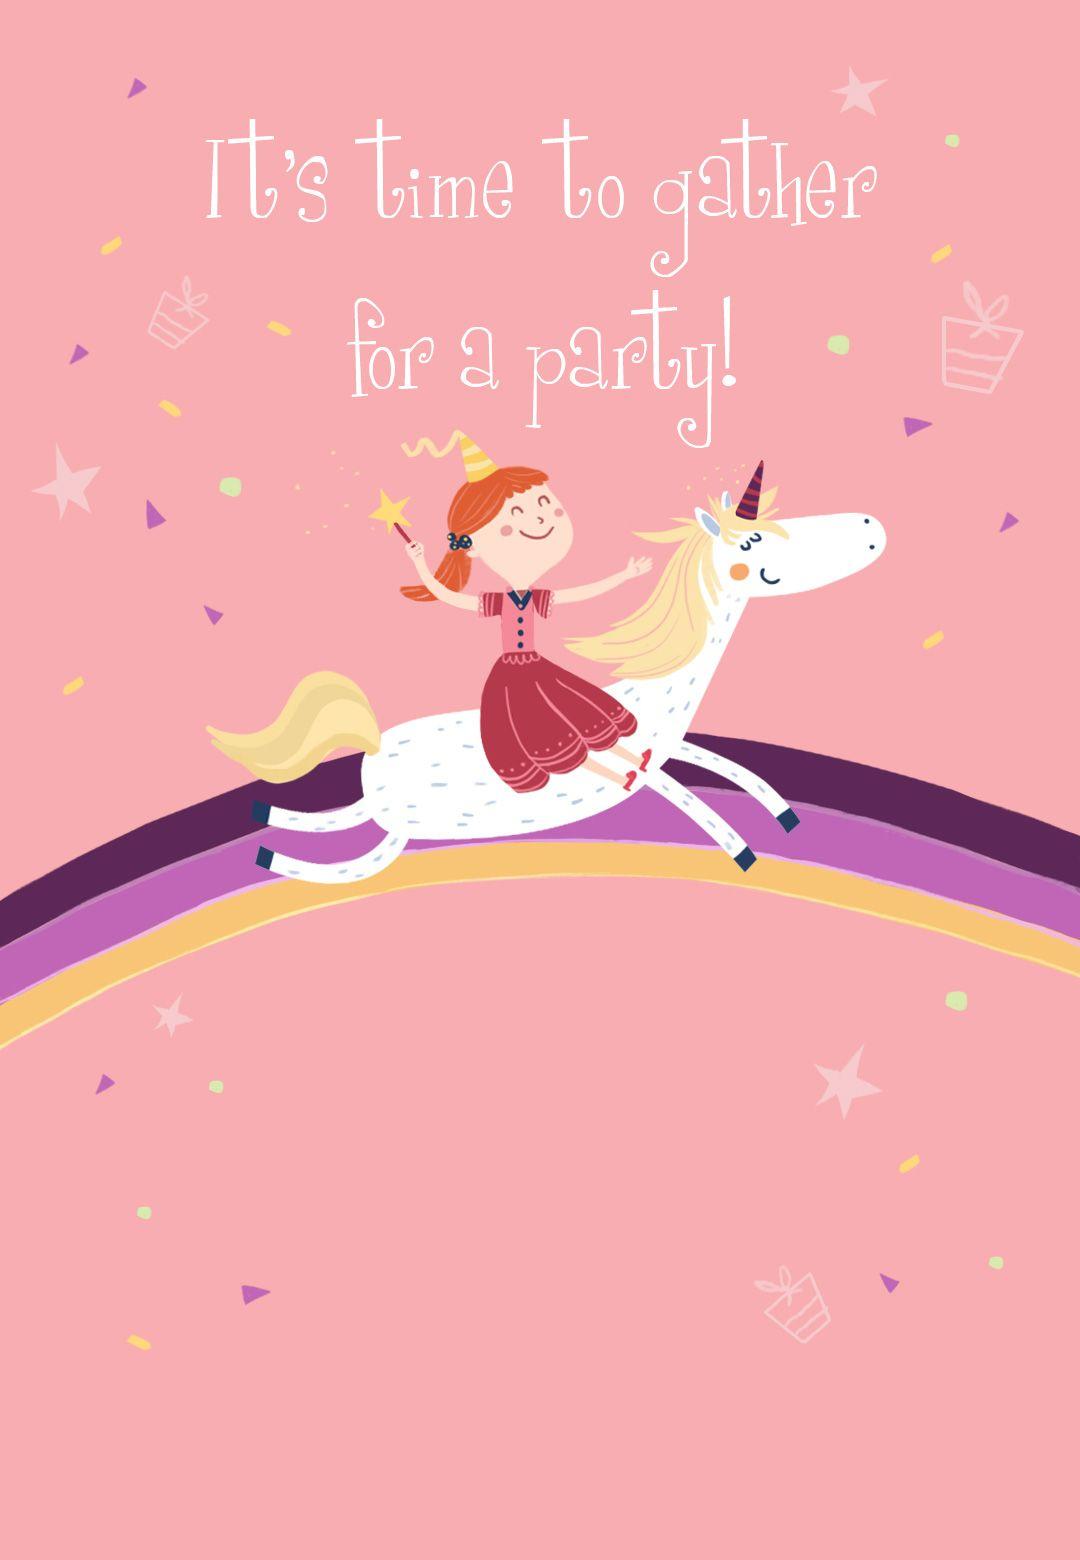 Unicorn - Free Printable Birthday Invitation Template | Greetings - Free Stork Party Invitations Printable